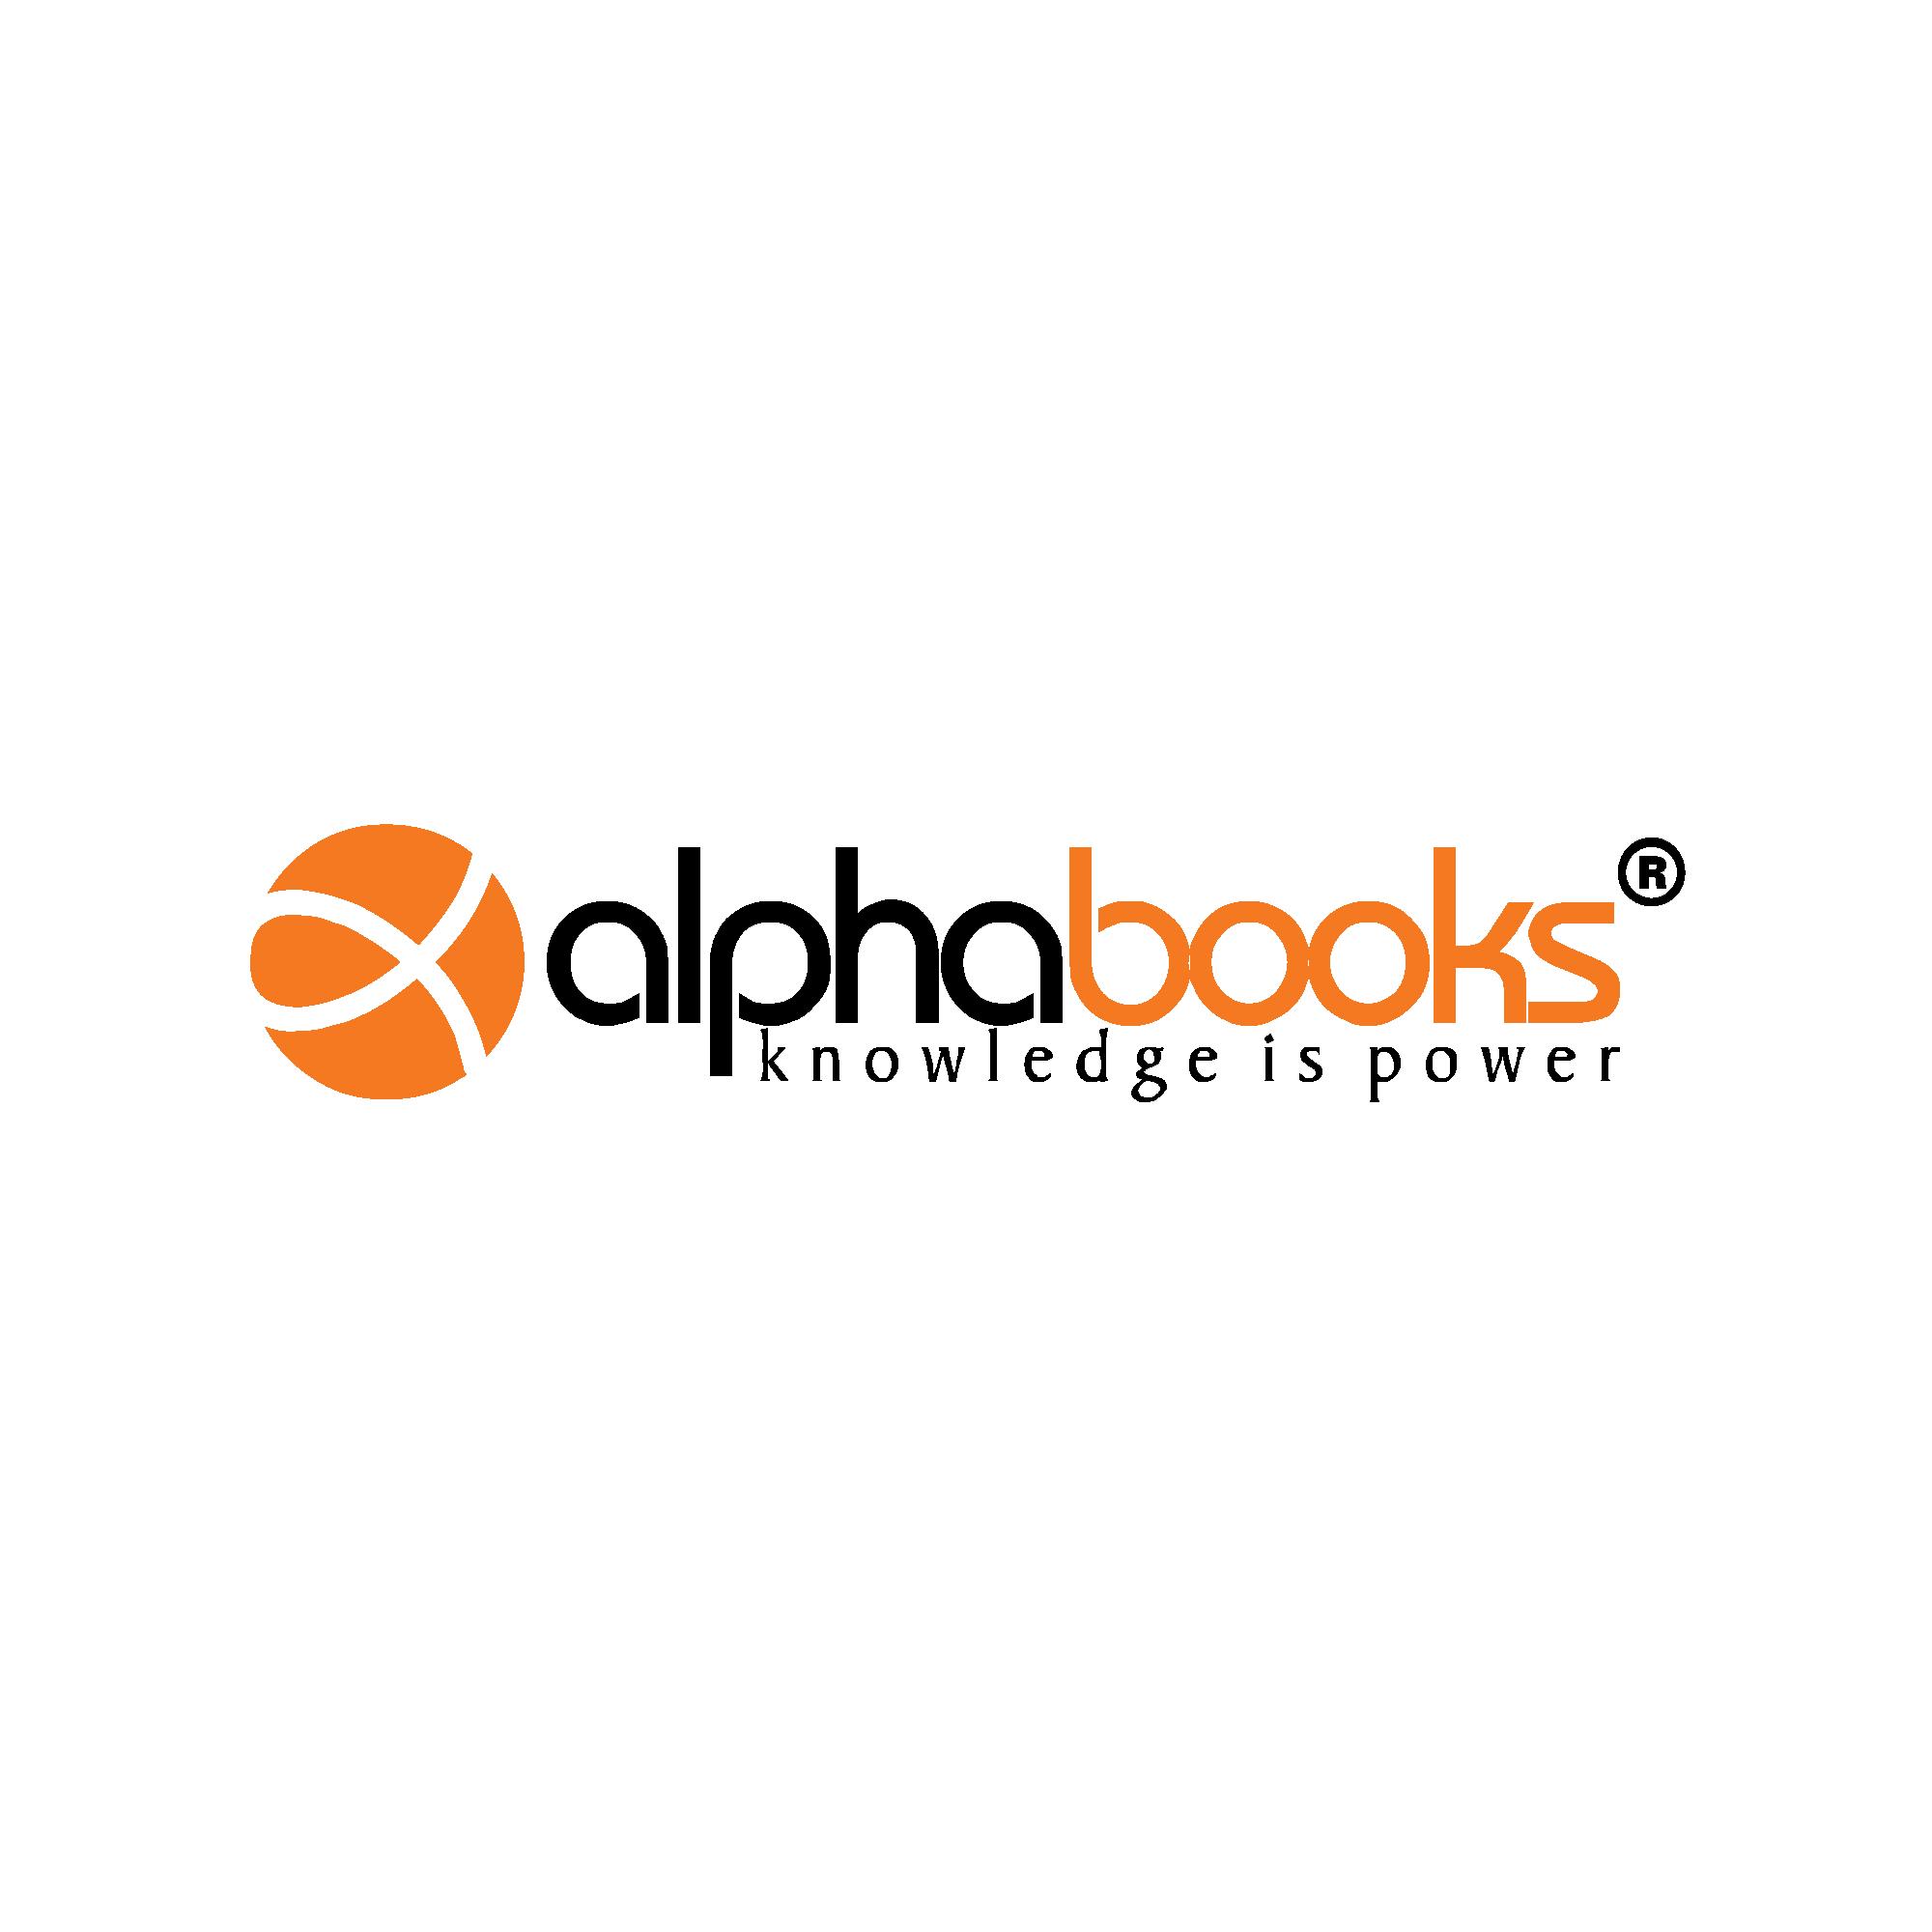 Alphabooks